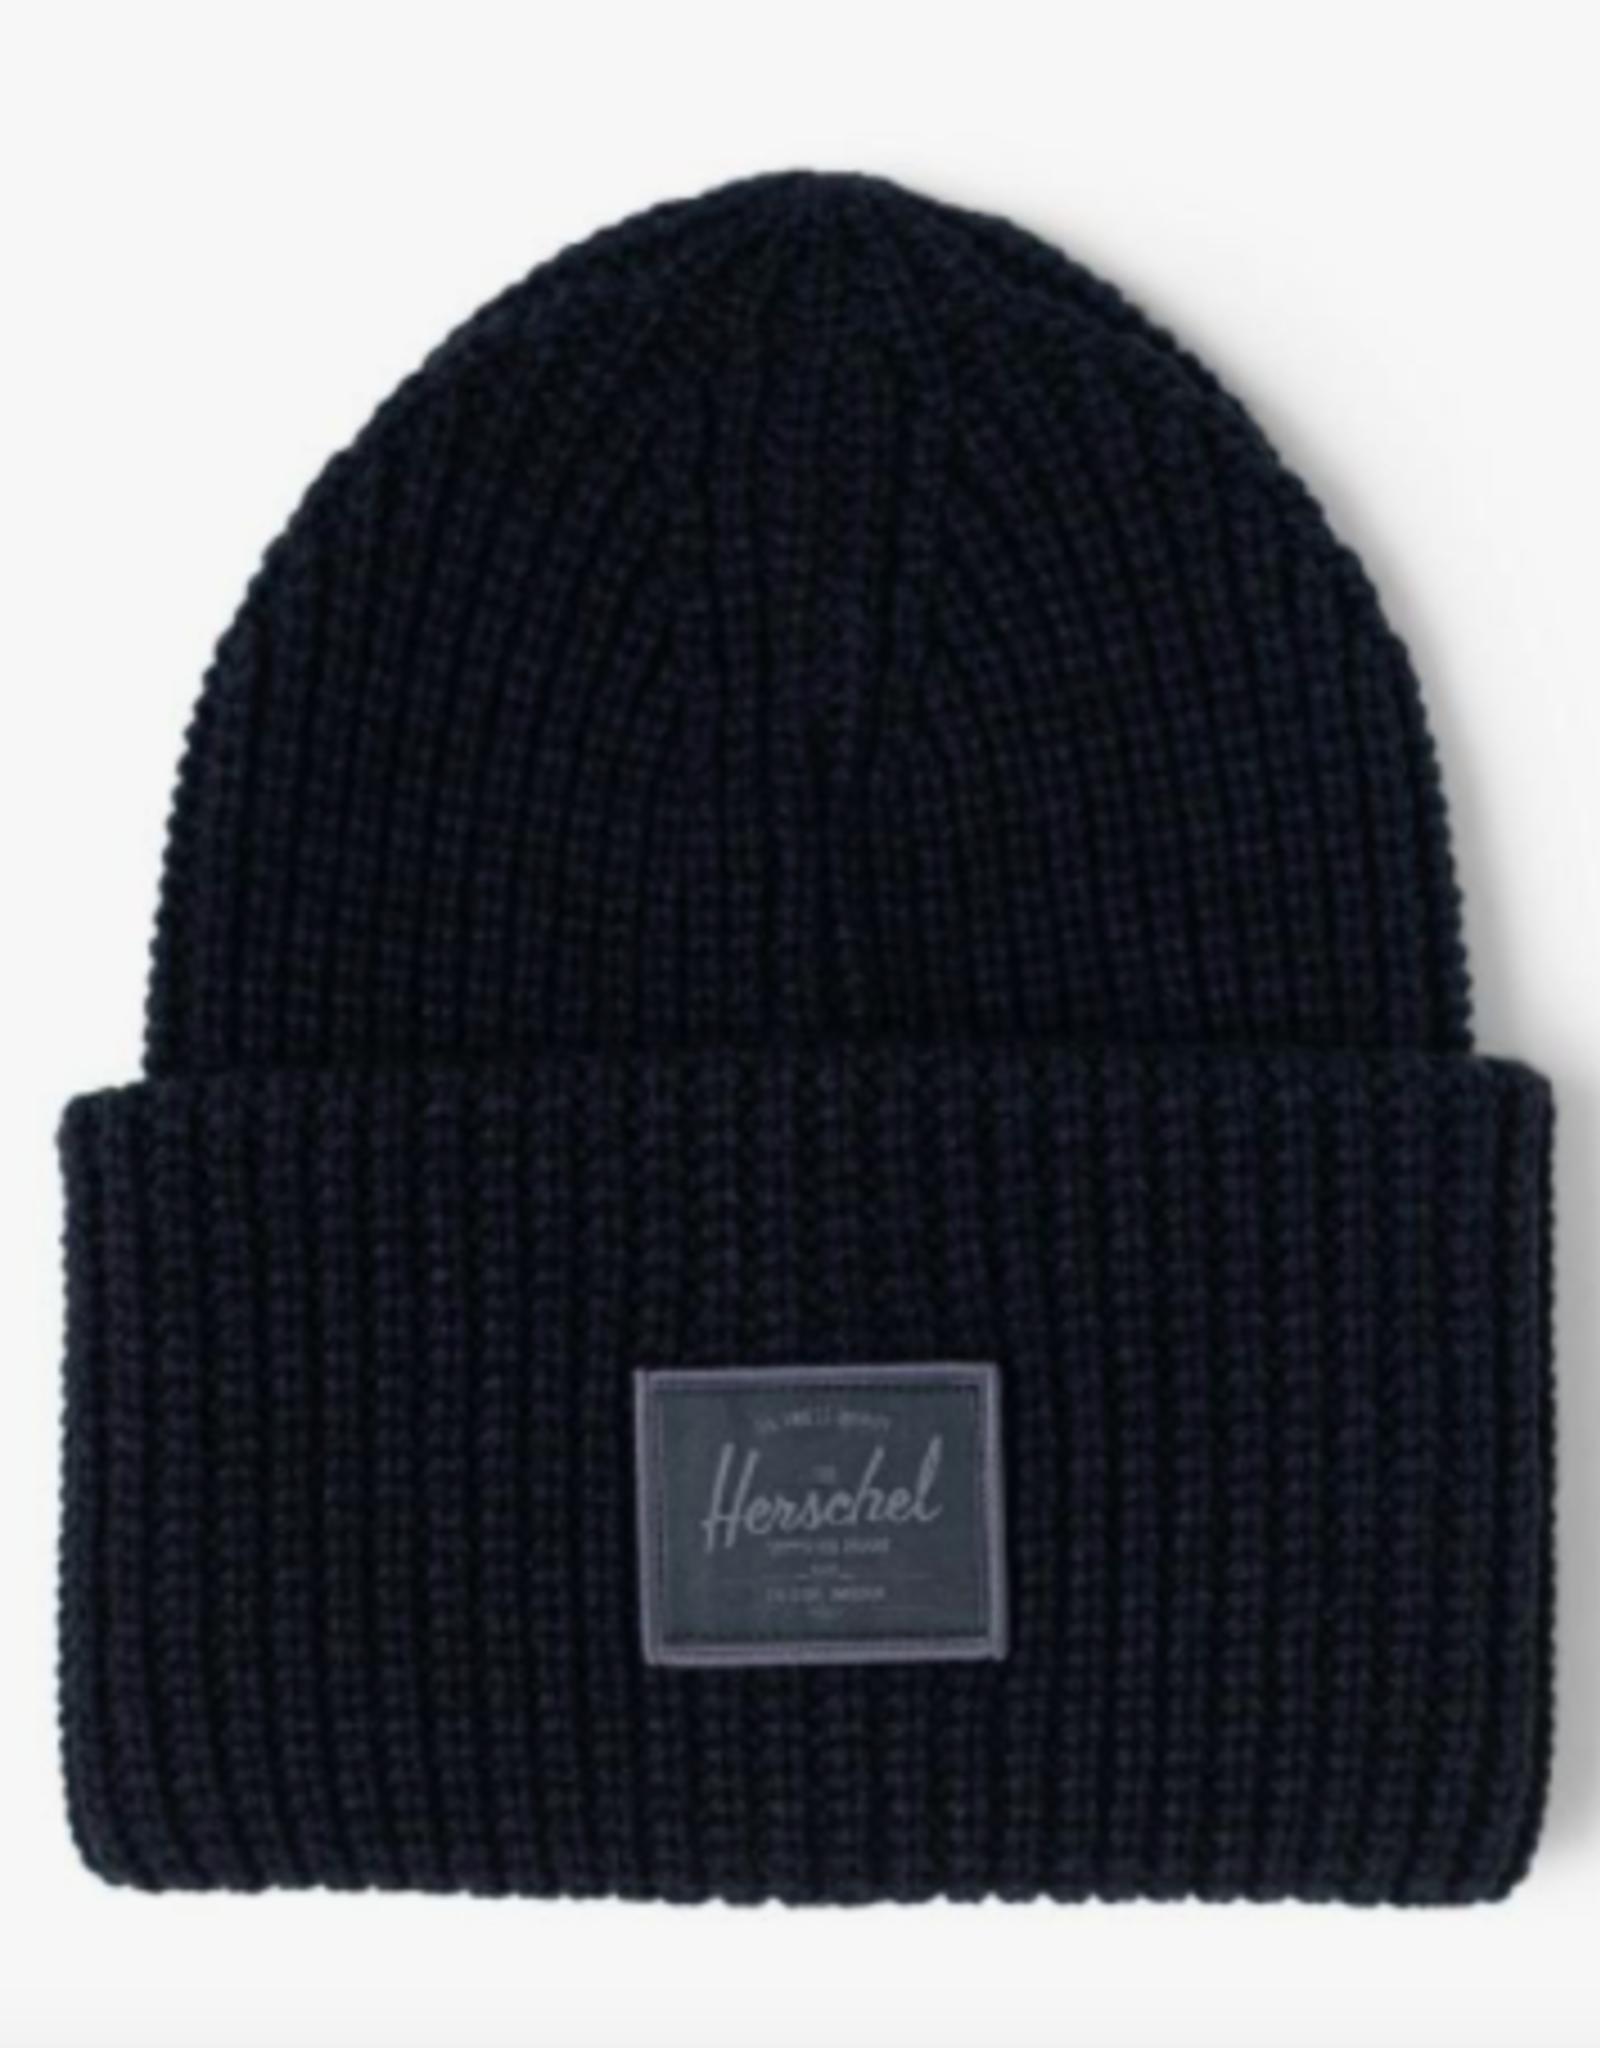 Herschel Juneau Acrylic Beanie